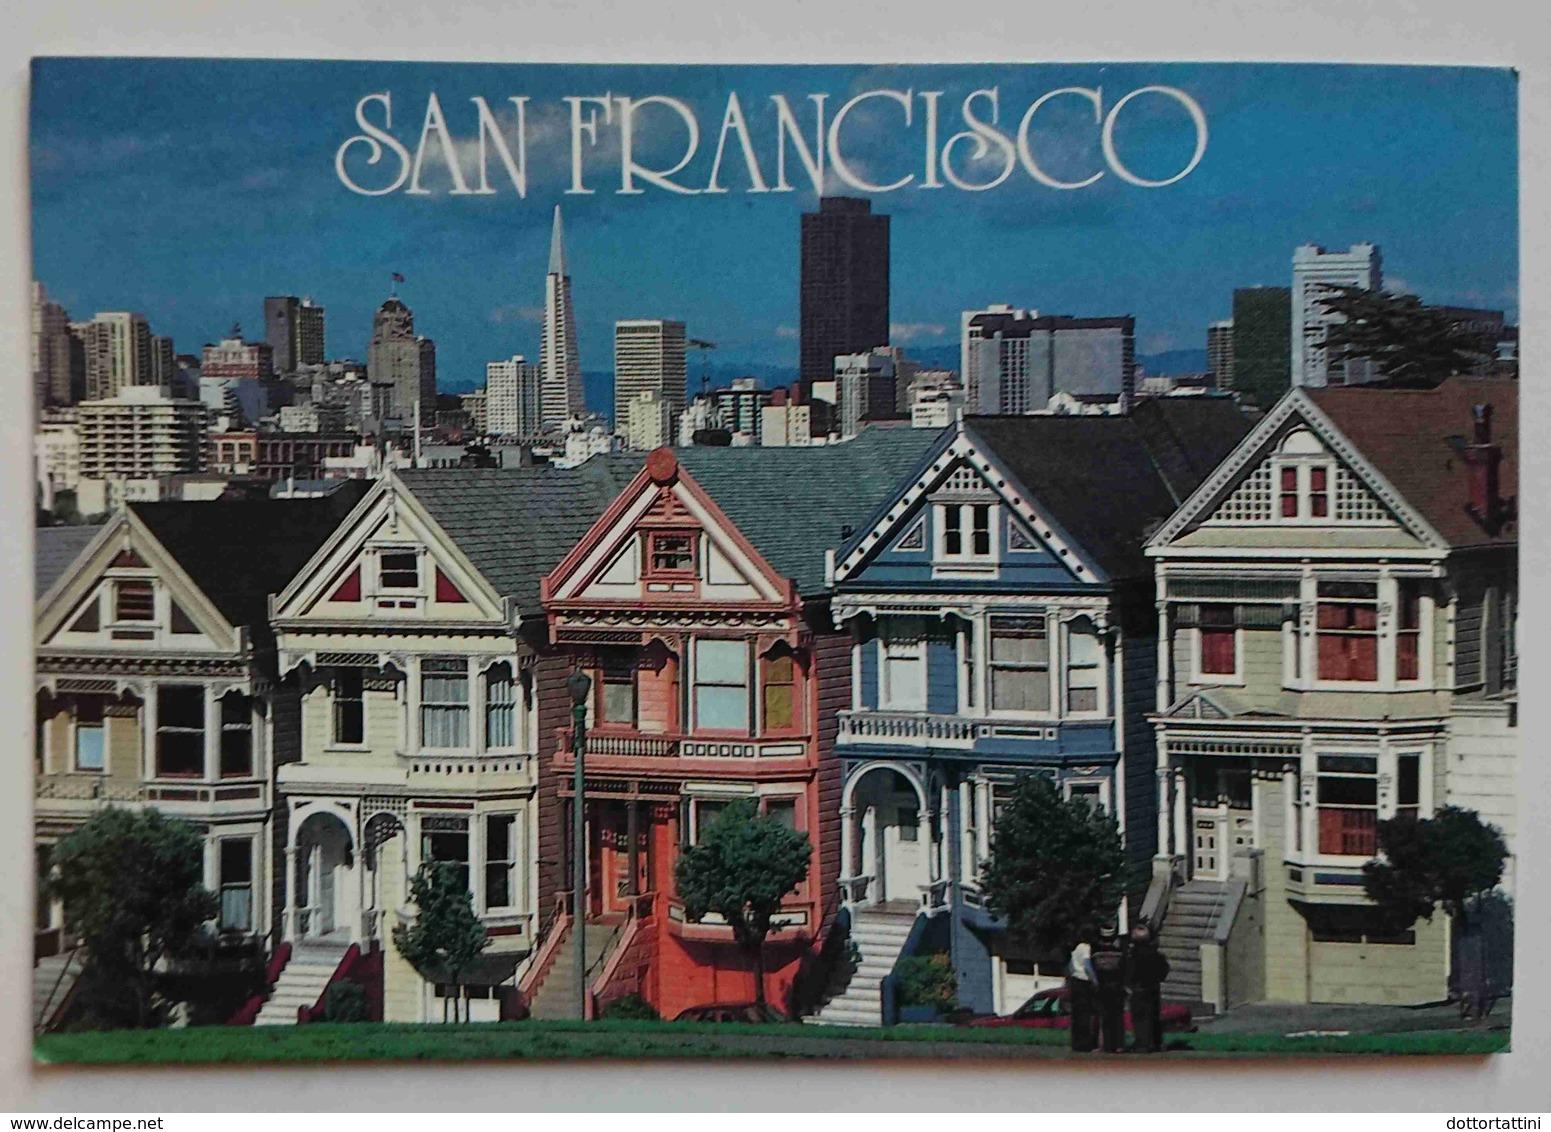 SAN FRANCISCO - Victorian Homes Line Steiner Street   - Vg - San Francisco